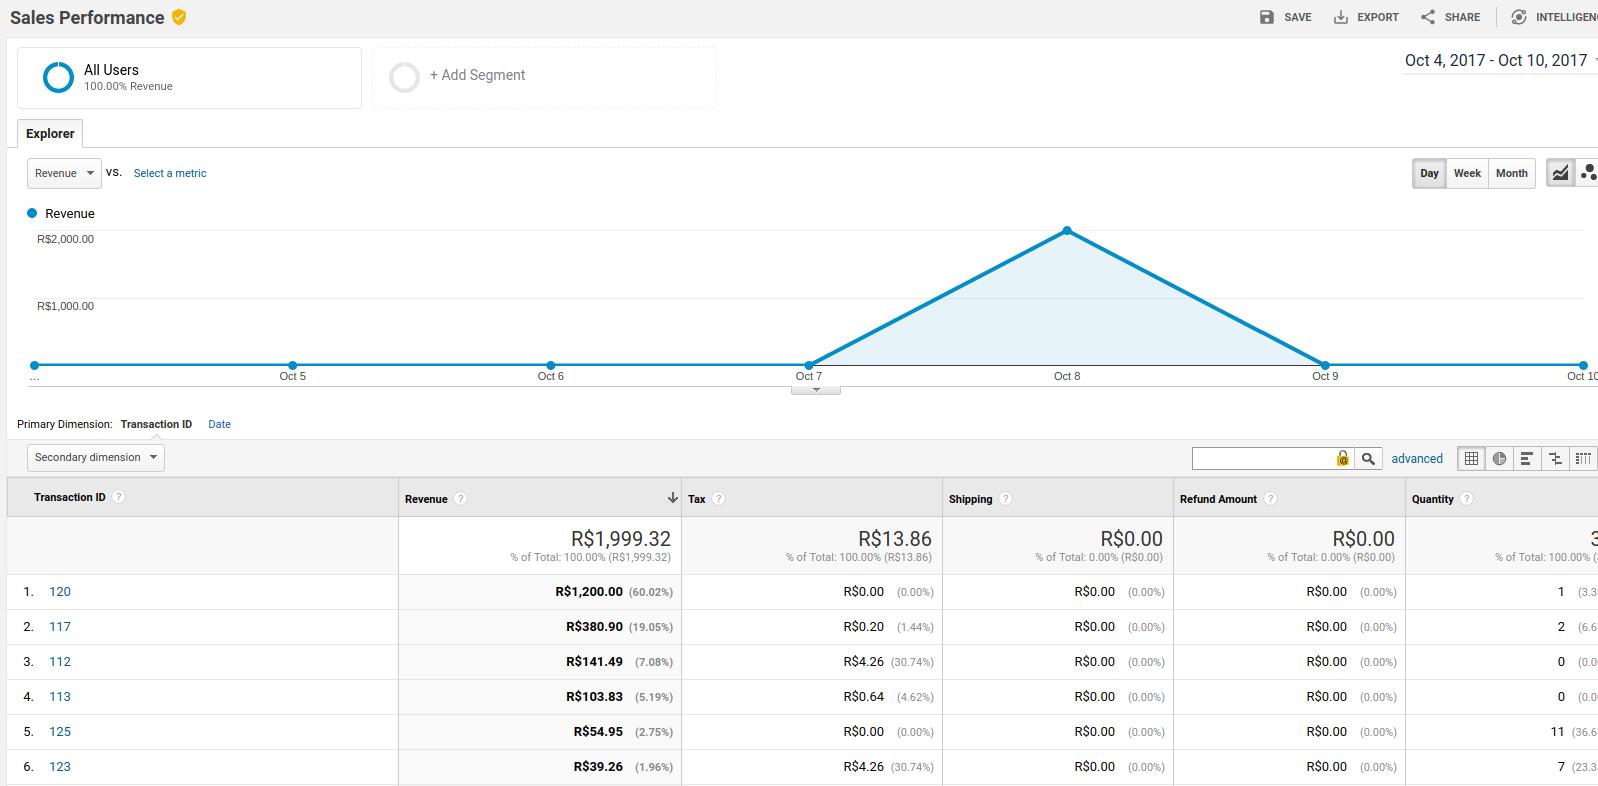 Sales-Performance-Analytics.png